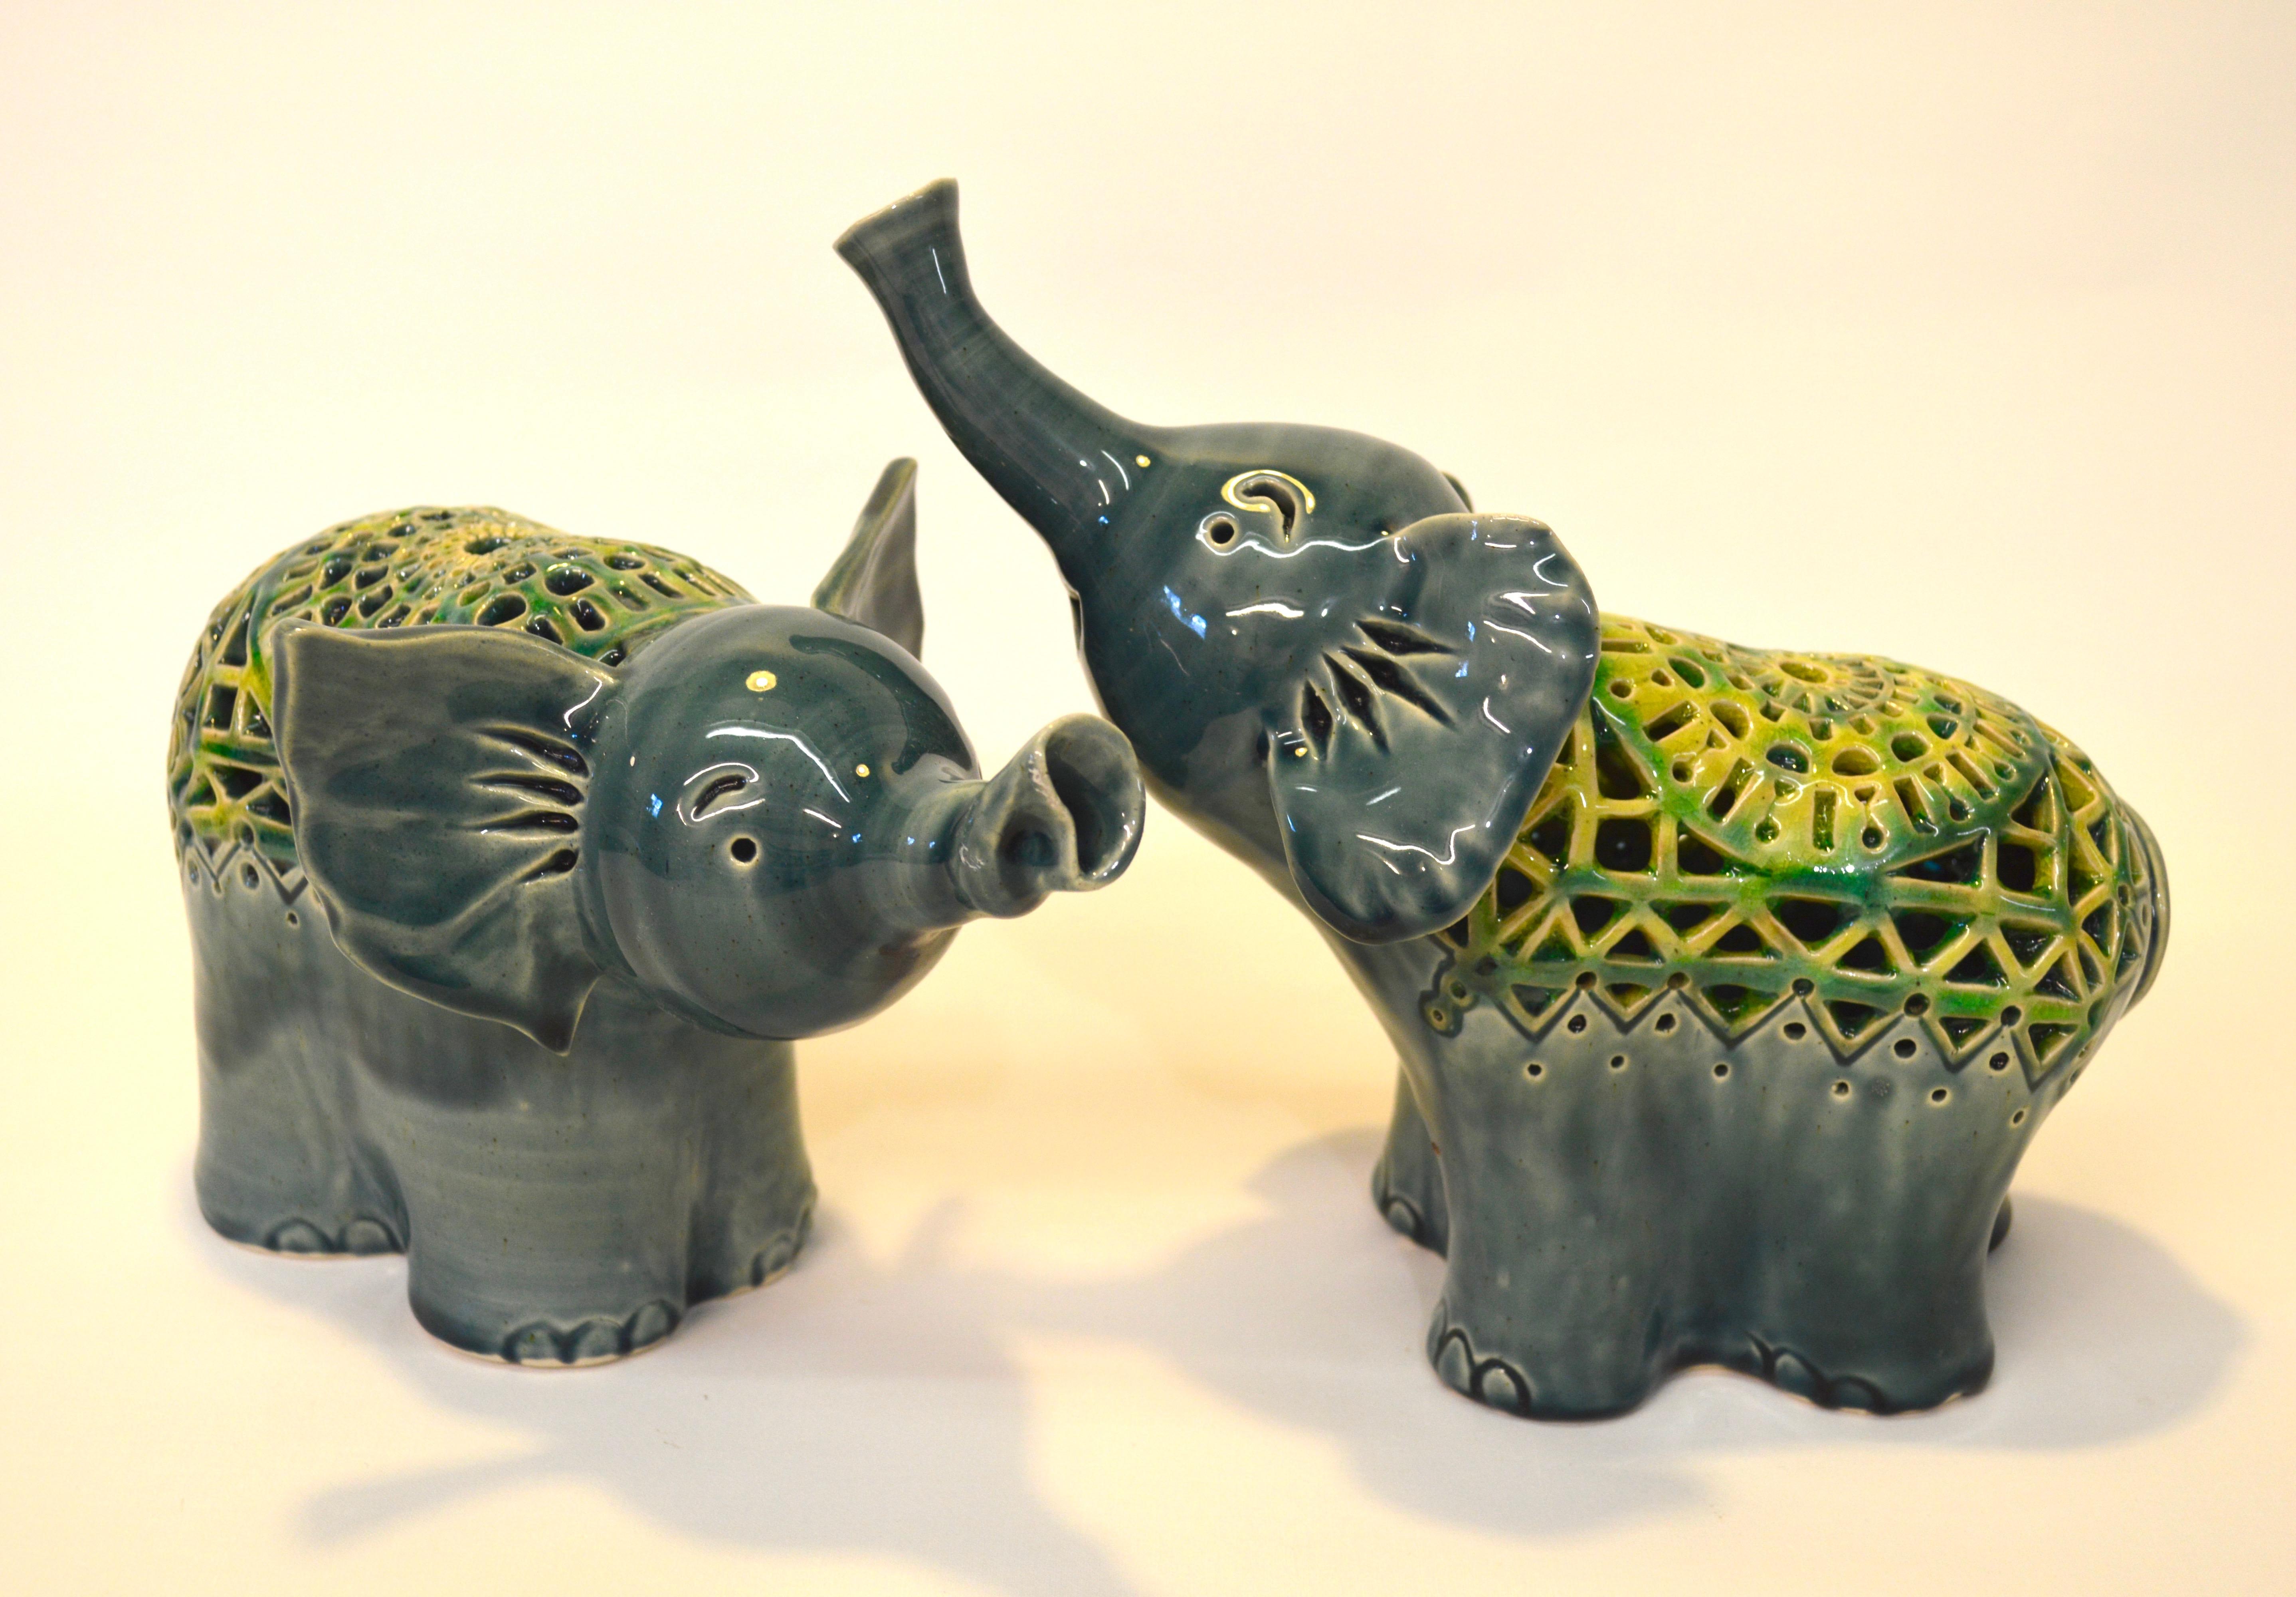 Elephant lanterns